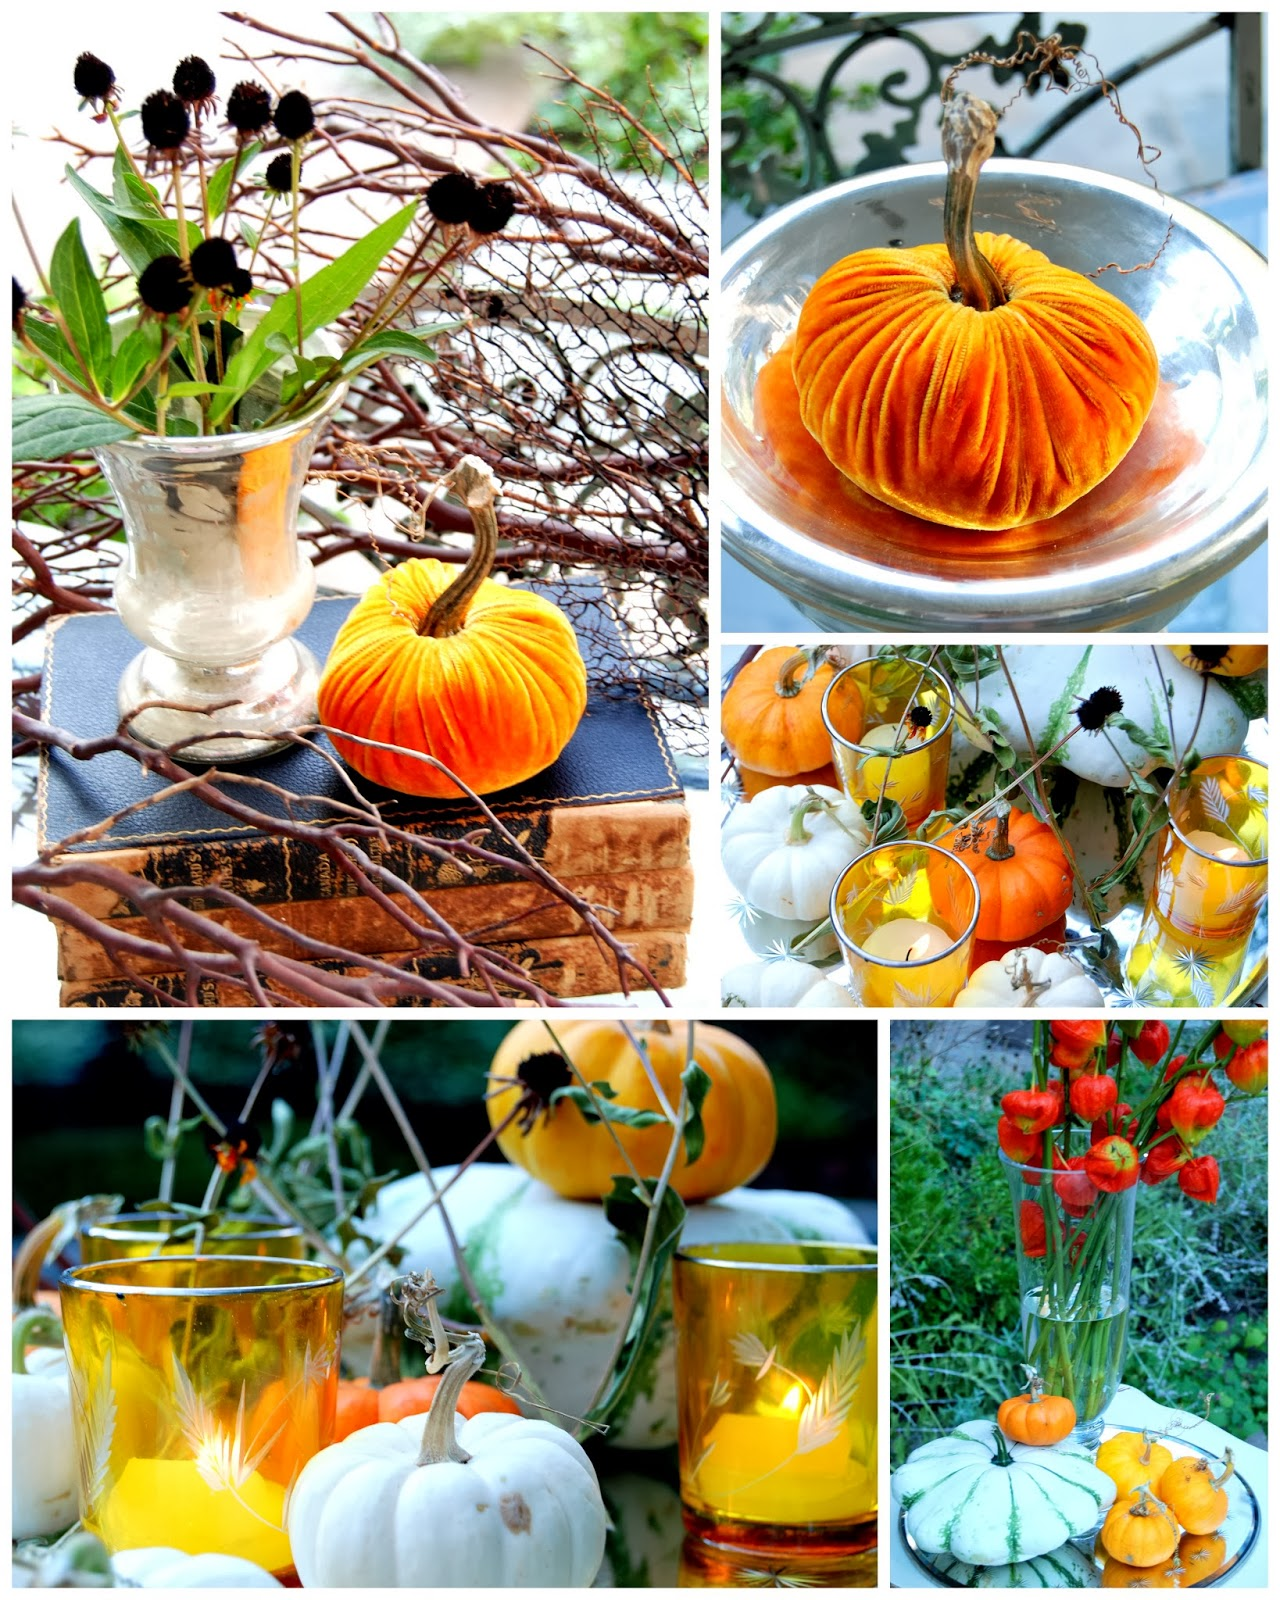 Pumpkins for October and Halloween